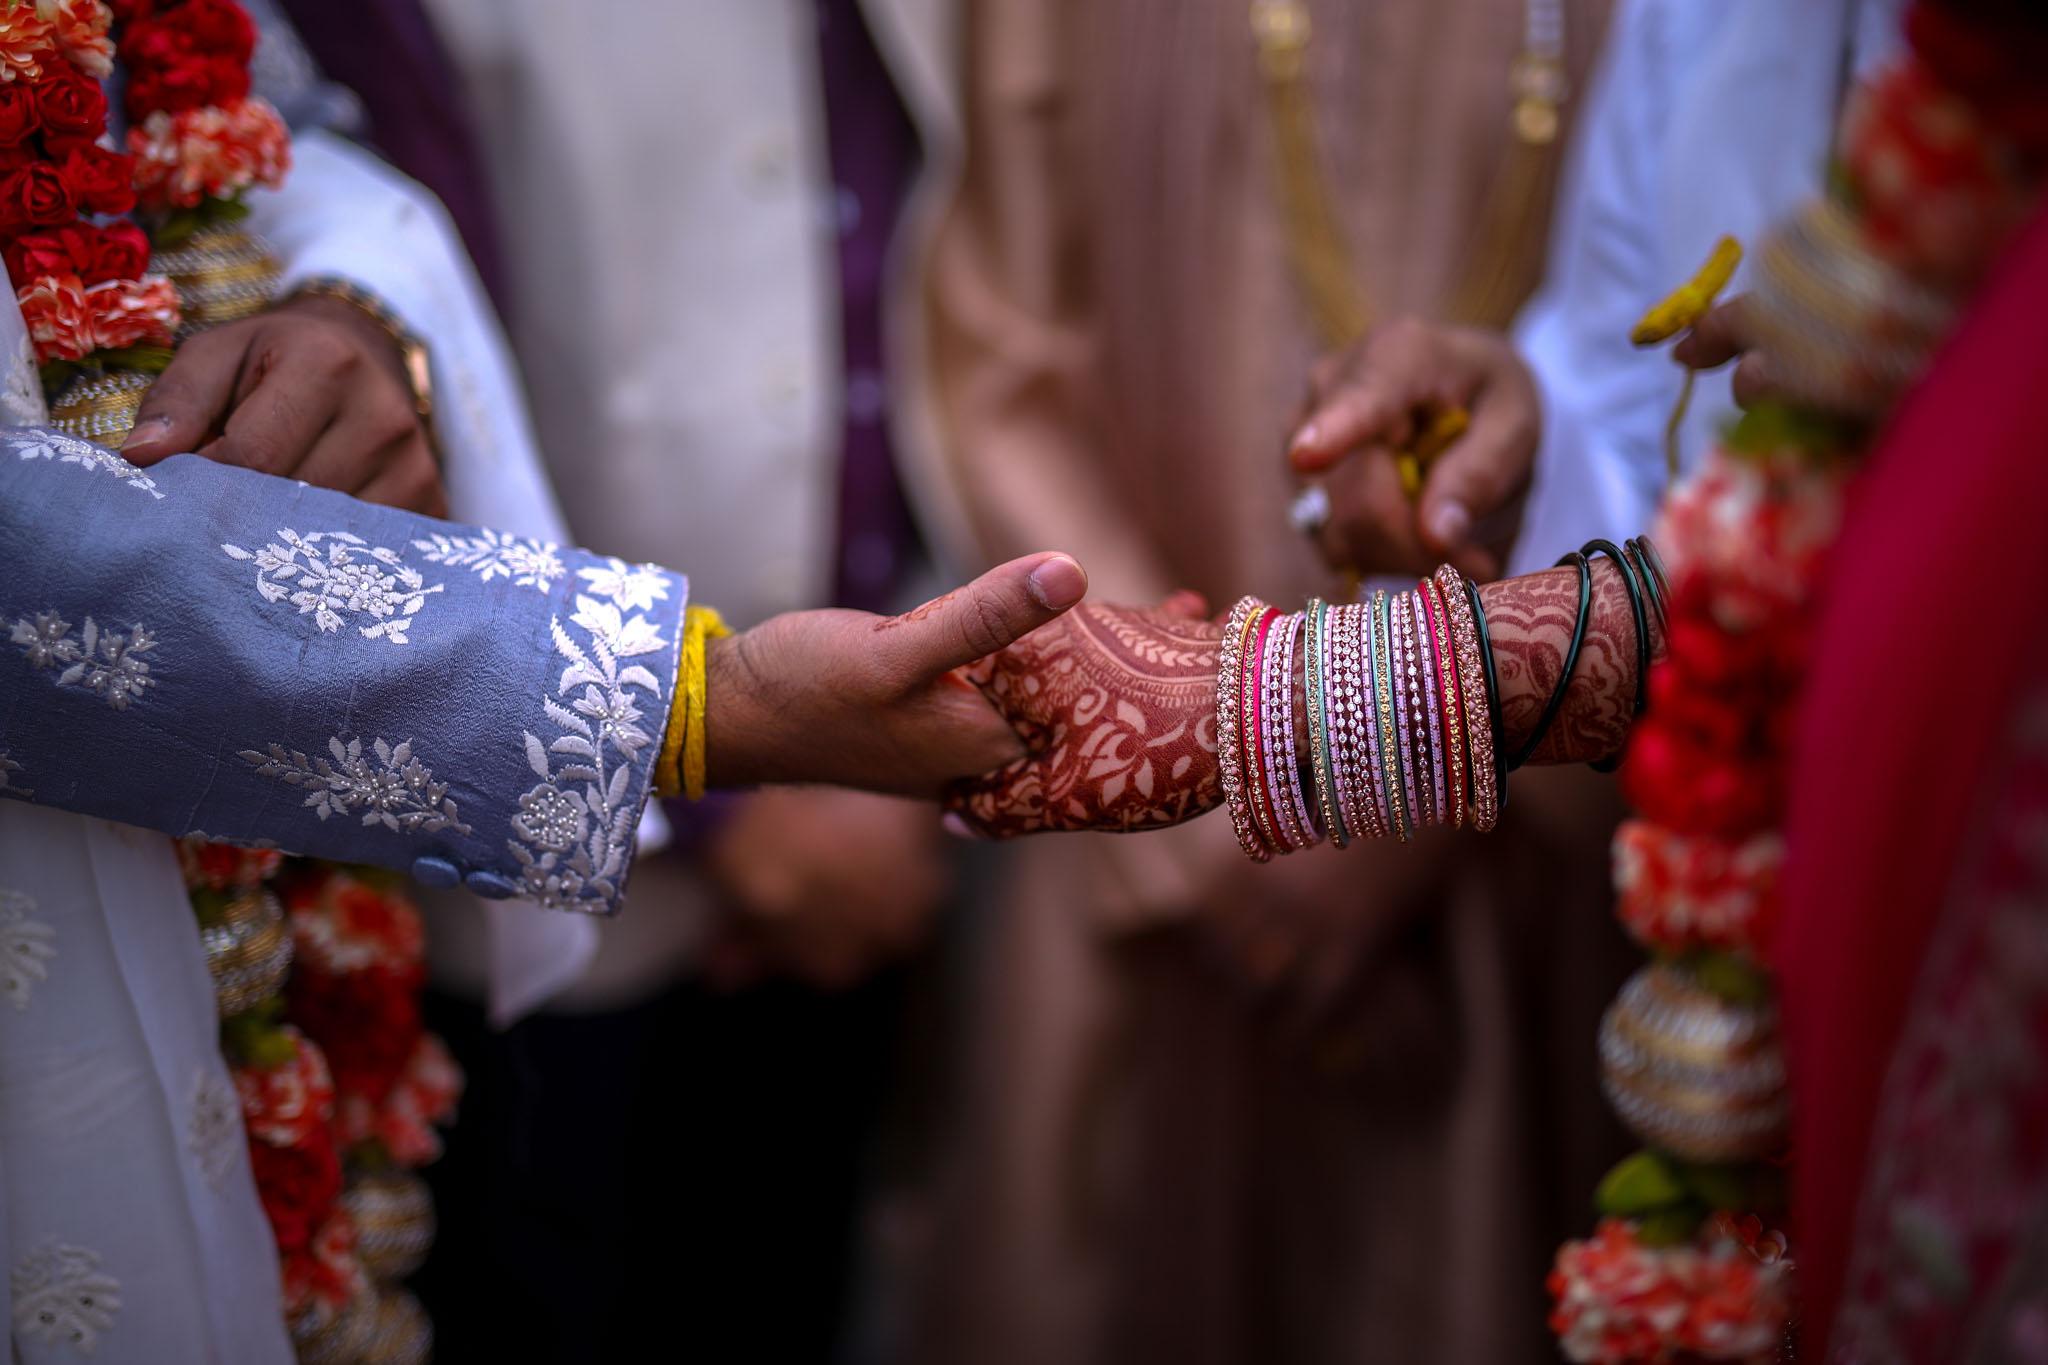 Mukti x Ojas Wedding Akshjay Sansare Photography Best wedding photographer in mumbai India Candid Cinematic Films videos-32.jpg